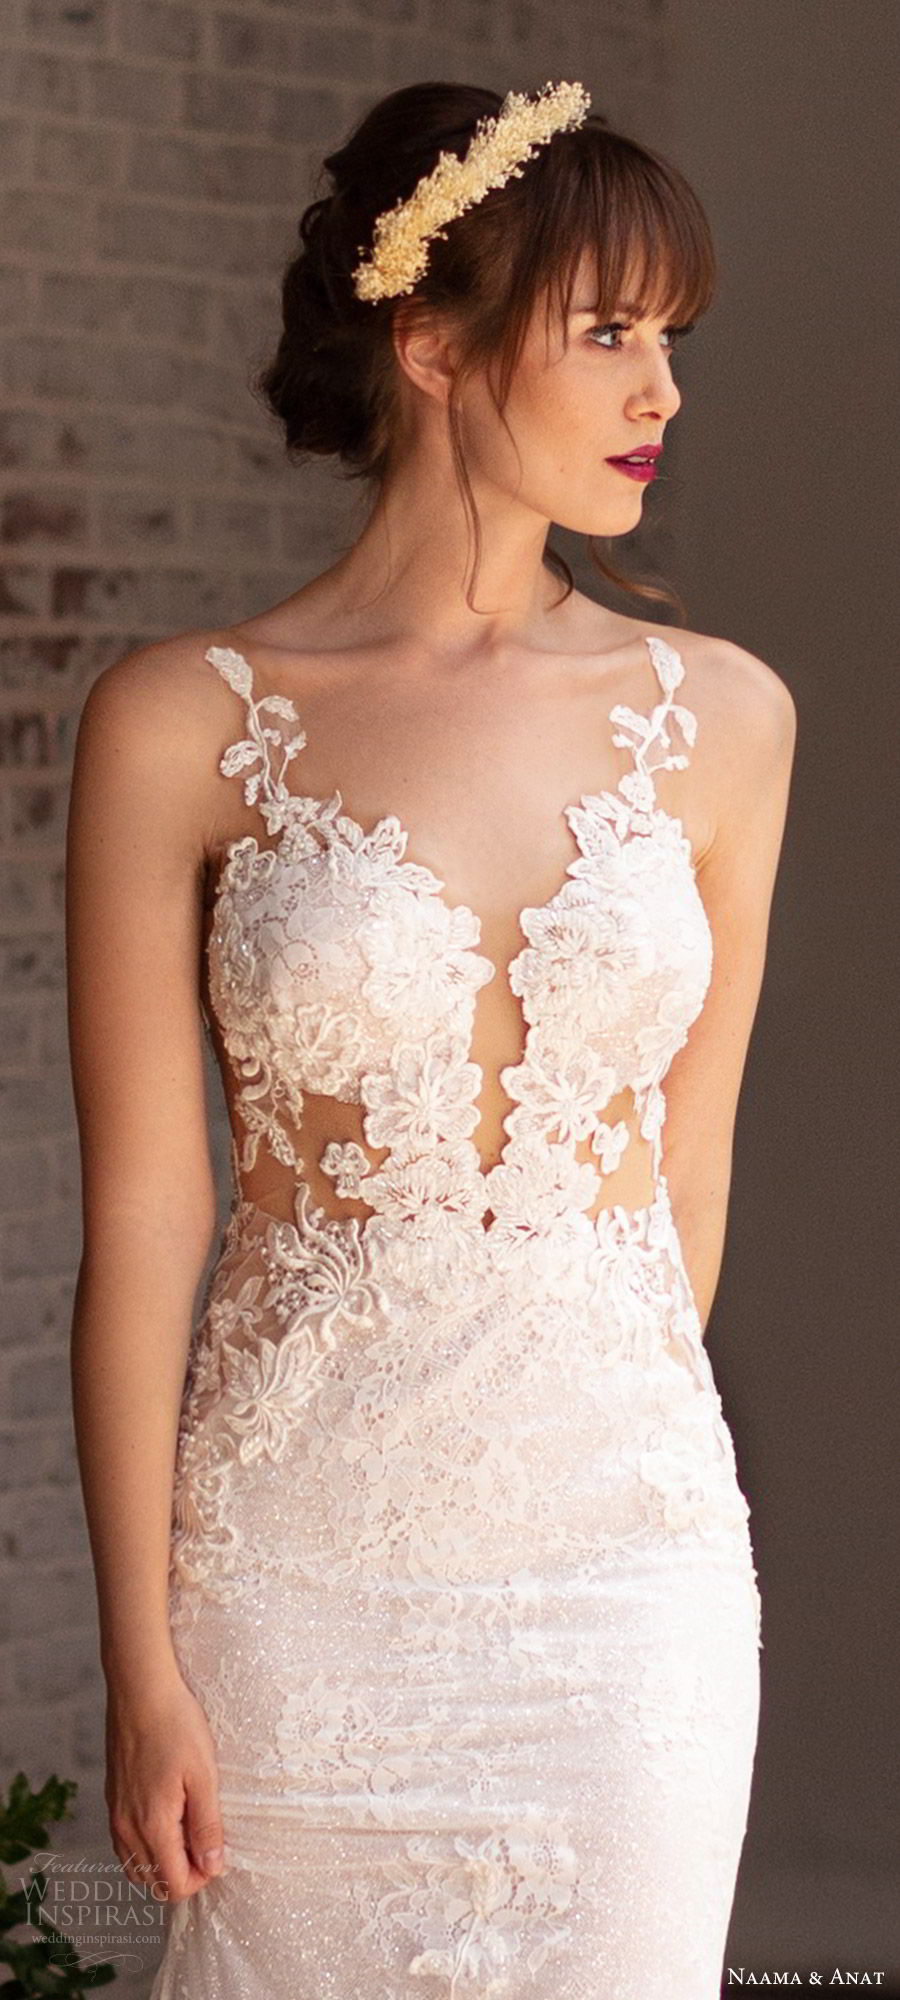 naama anat 2019 bridal sleeveless deep plunging sweetheart neckline sheath fit flare lace wedding dress low back chapel train sexy elegant (3) zv